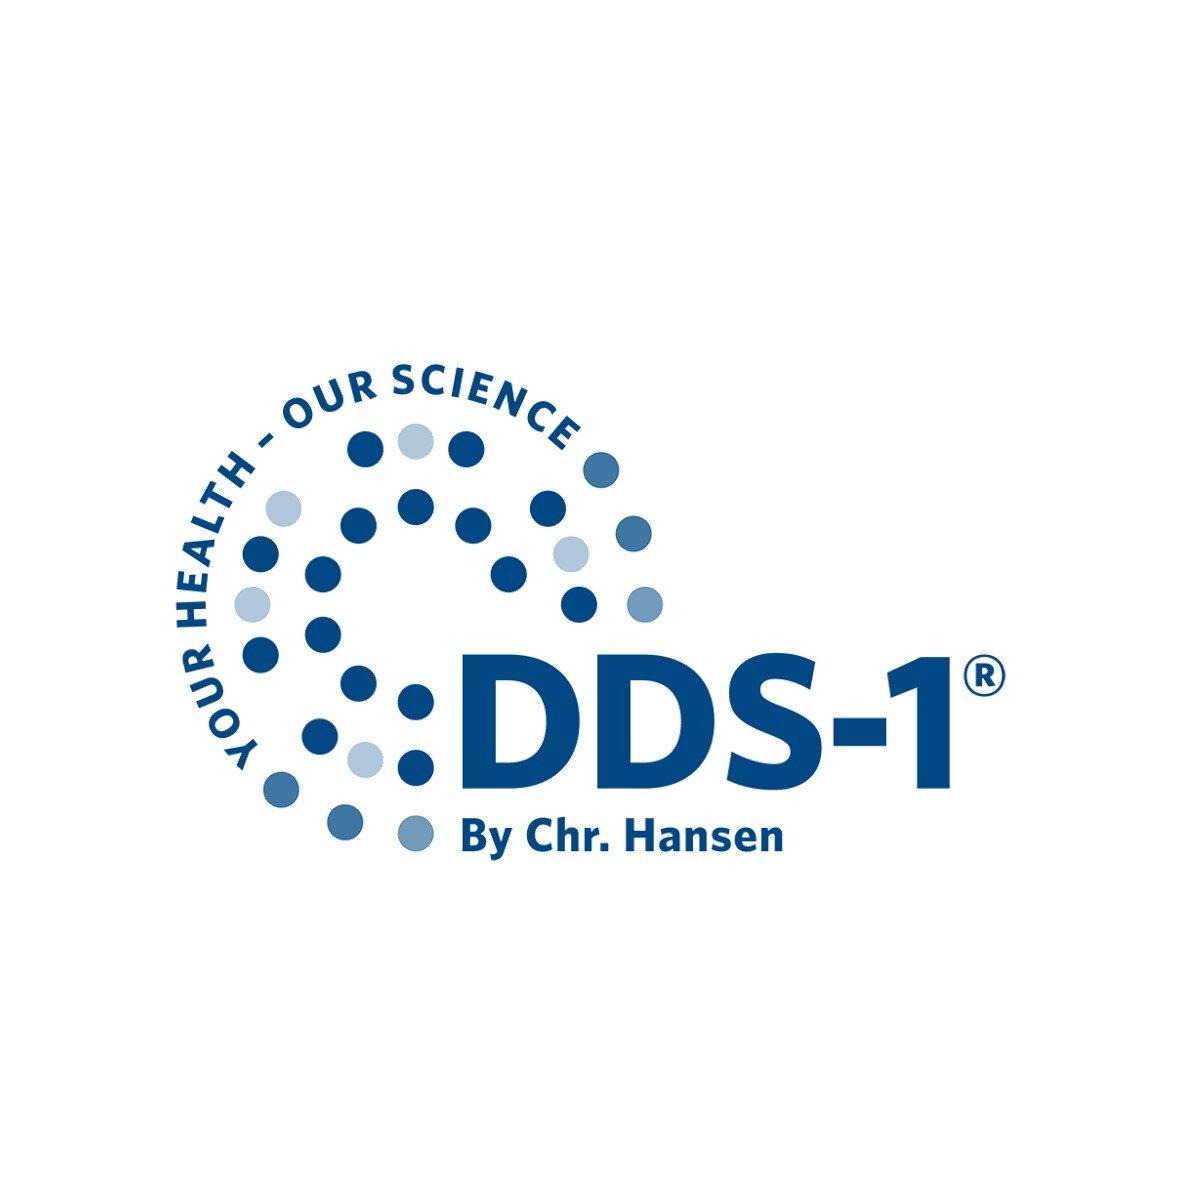 益生菌 原料 DDS-1 嗜酸乳桿菌 (Lactobacillus Acidophilus)